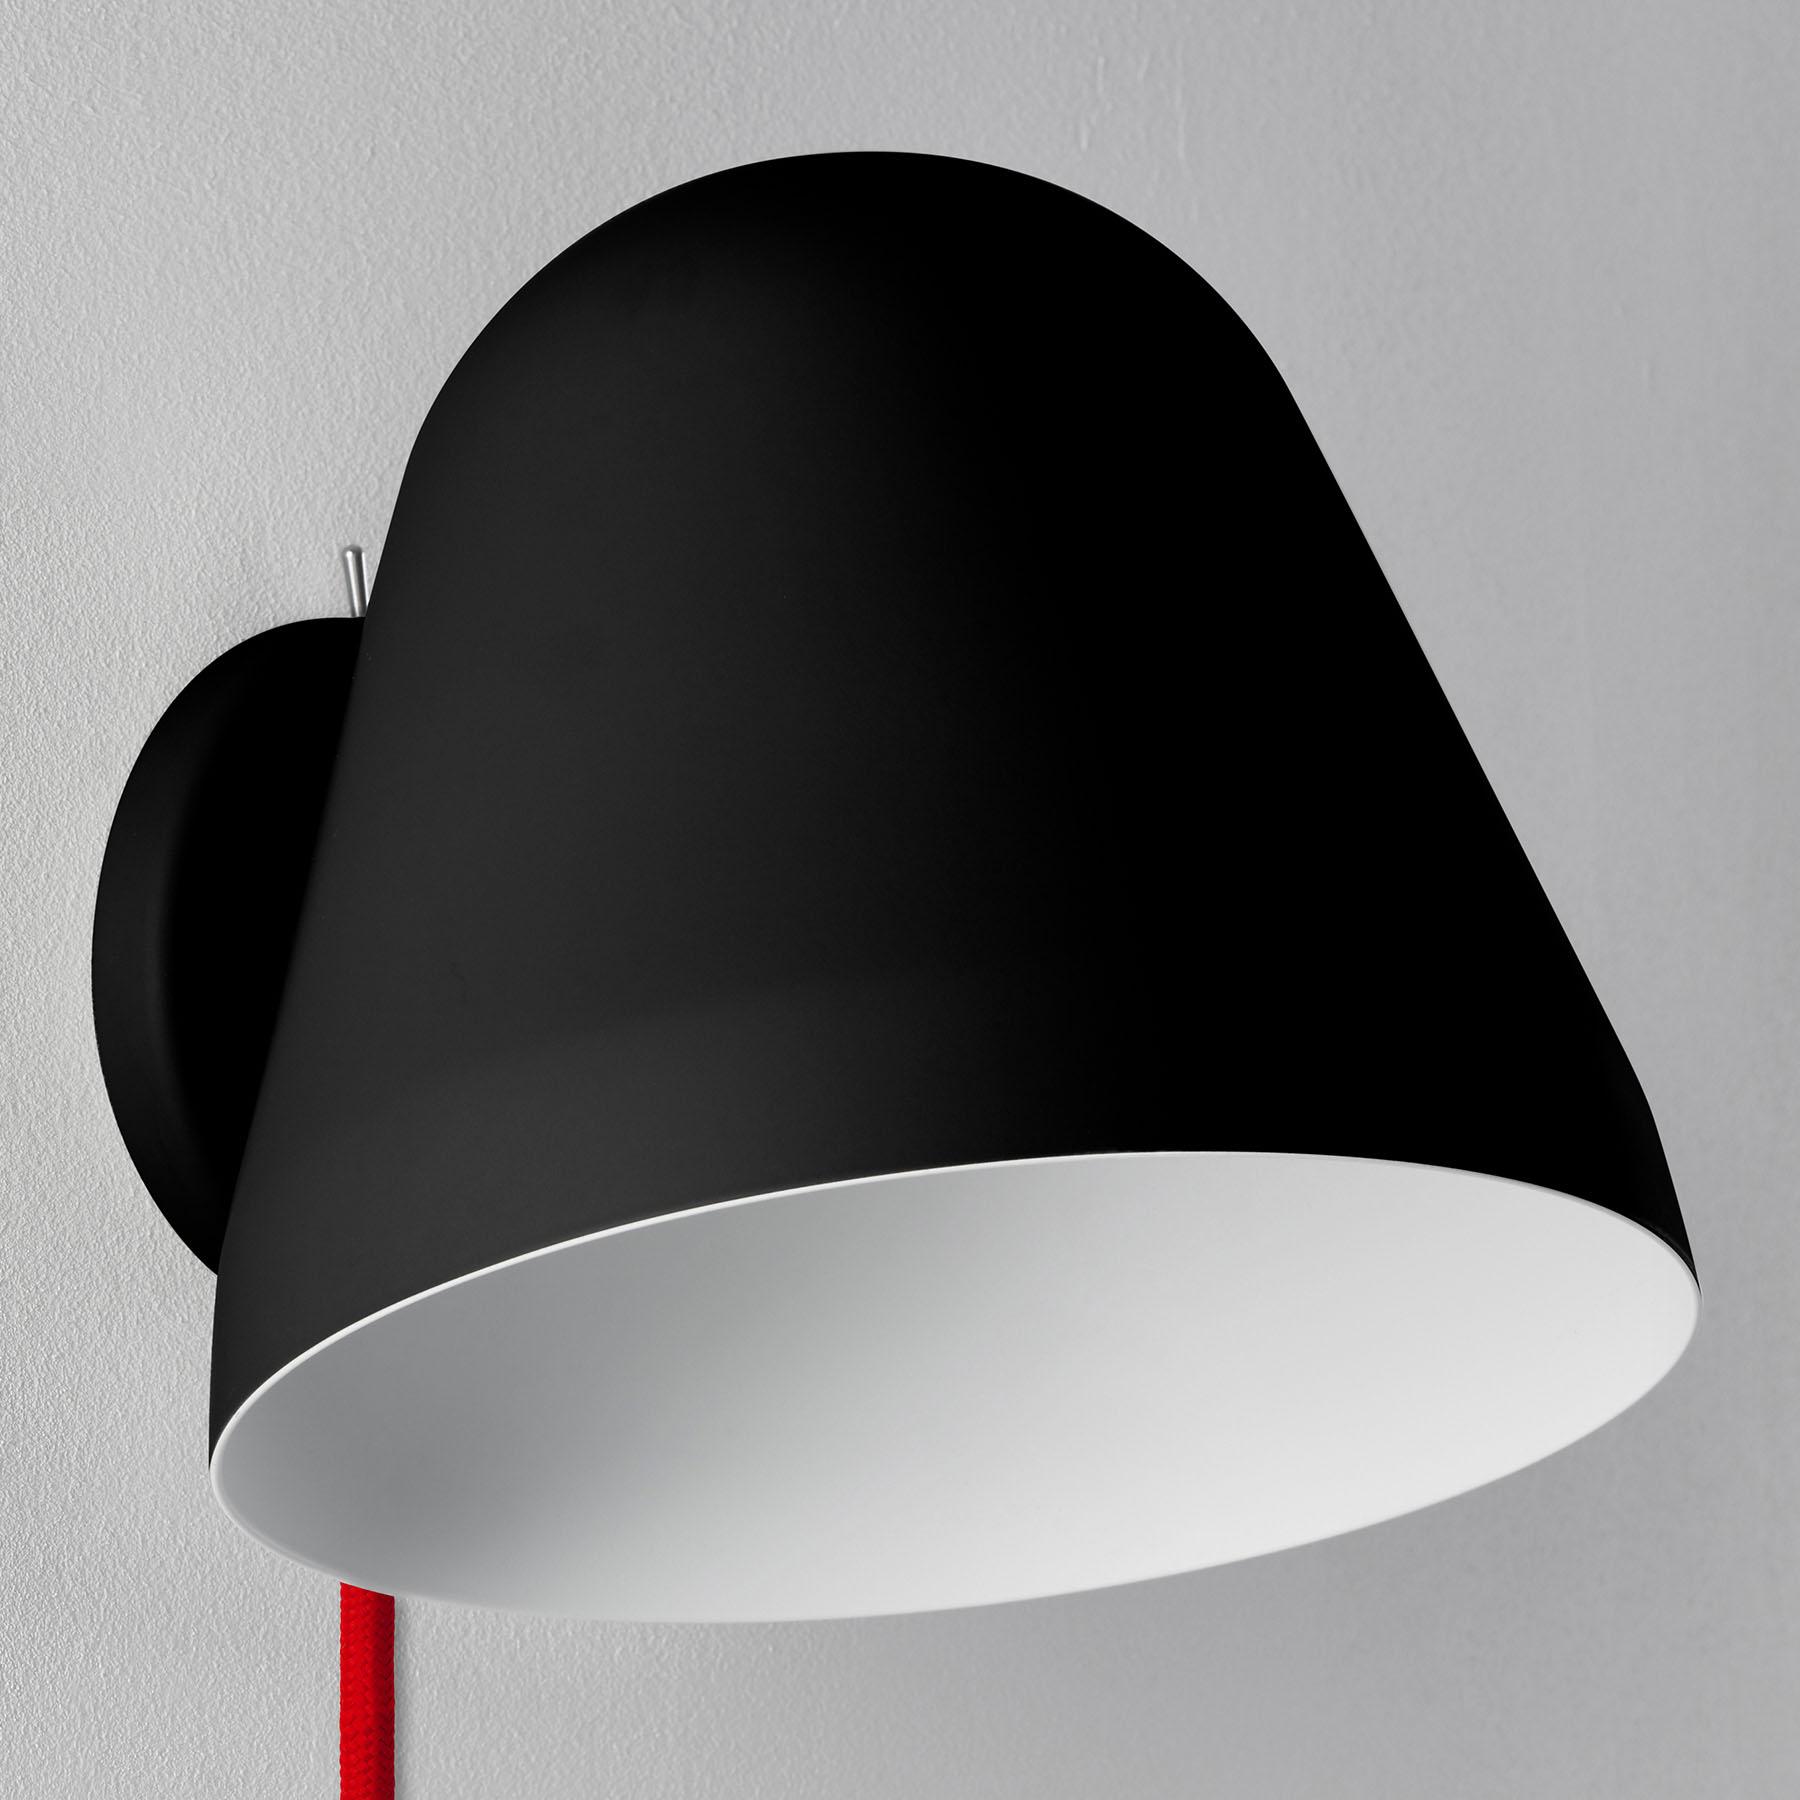 Nyta Tilt Wall Short wandlamp kabel rood, zwart